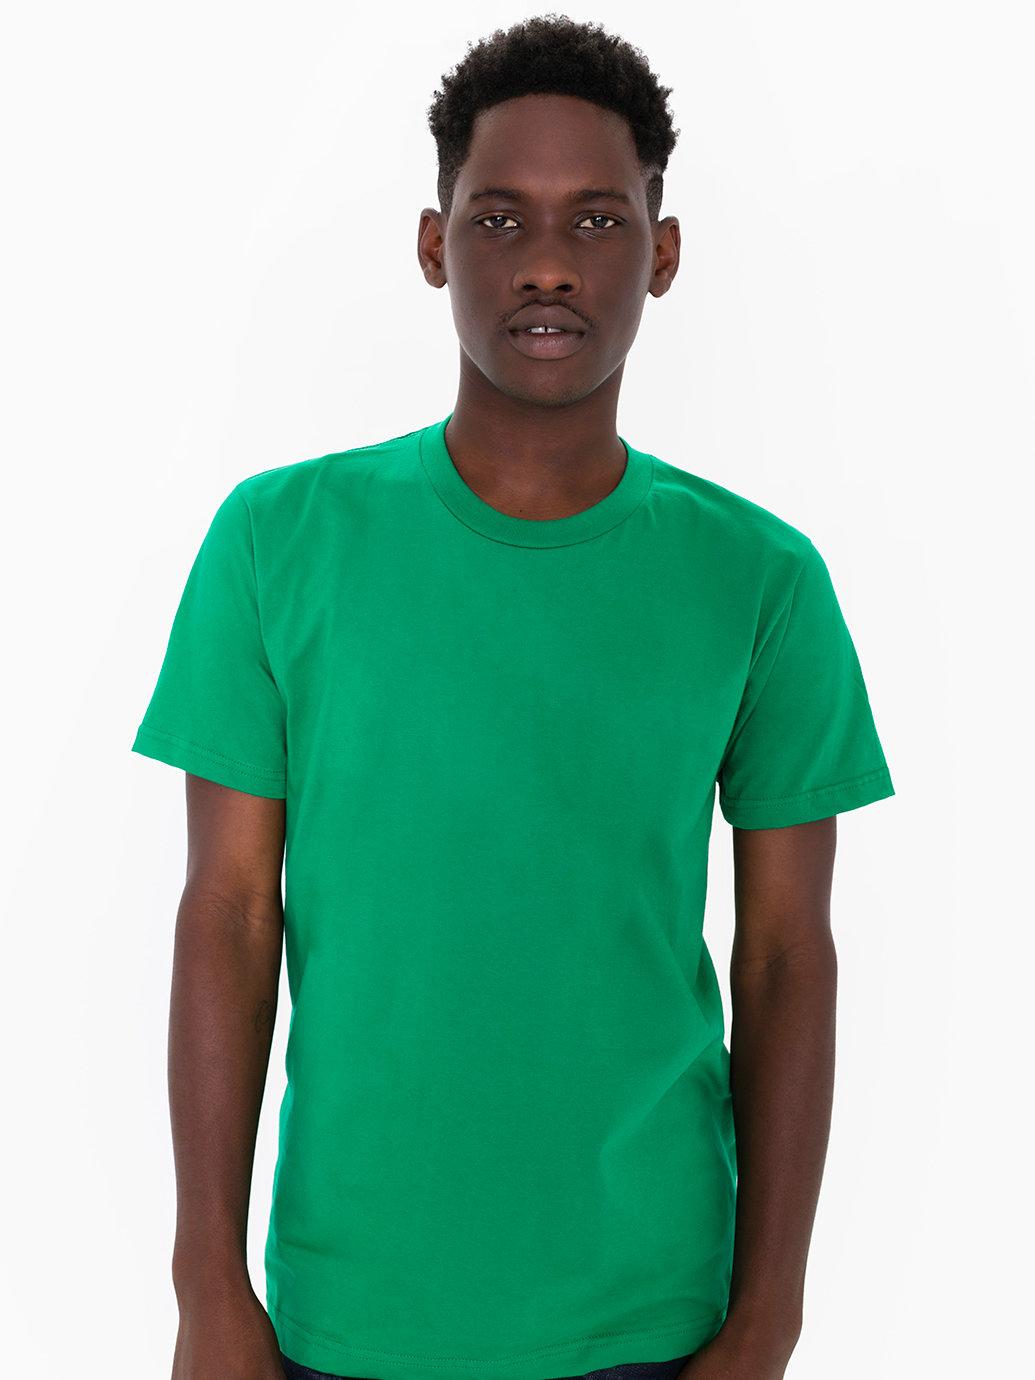 American apparel fine jersey crewneck t shirt in green for for American apparel fine jersey crewneck t shirt